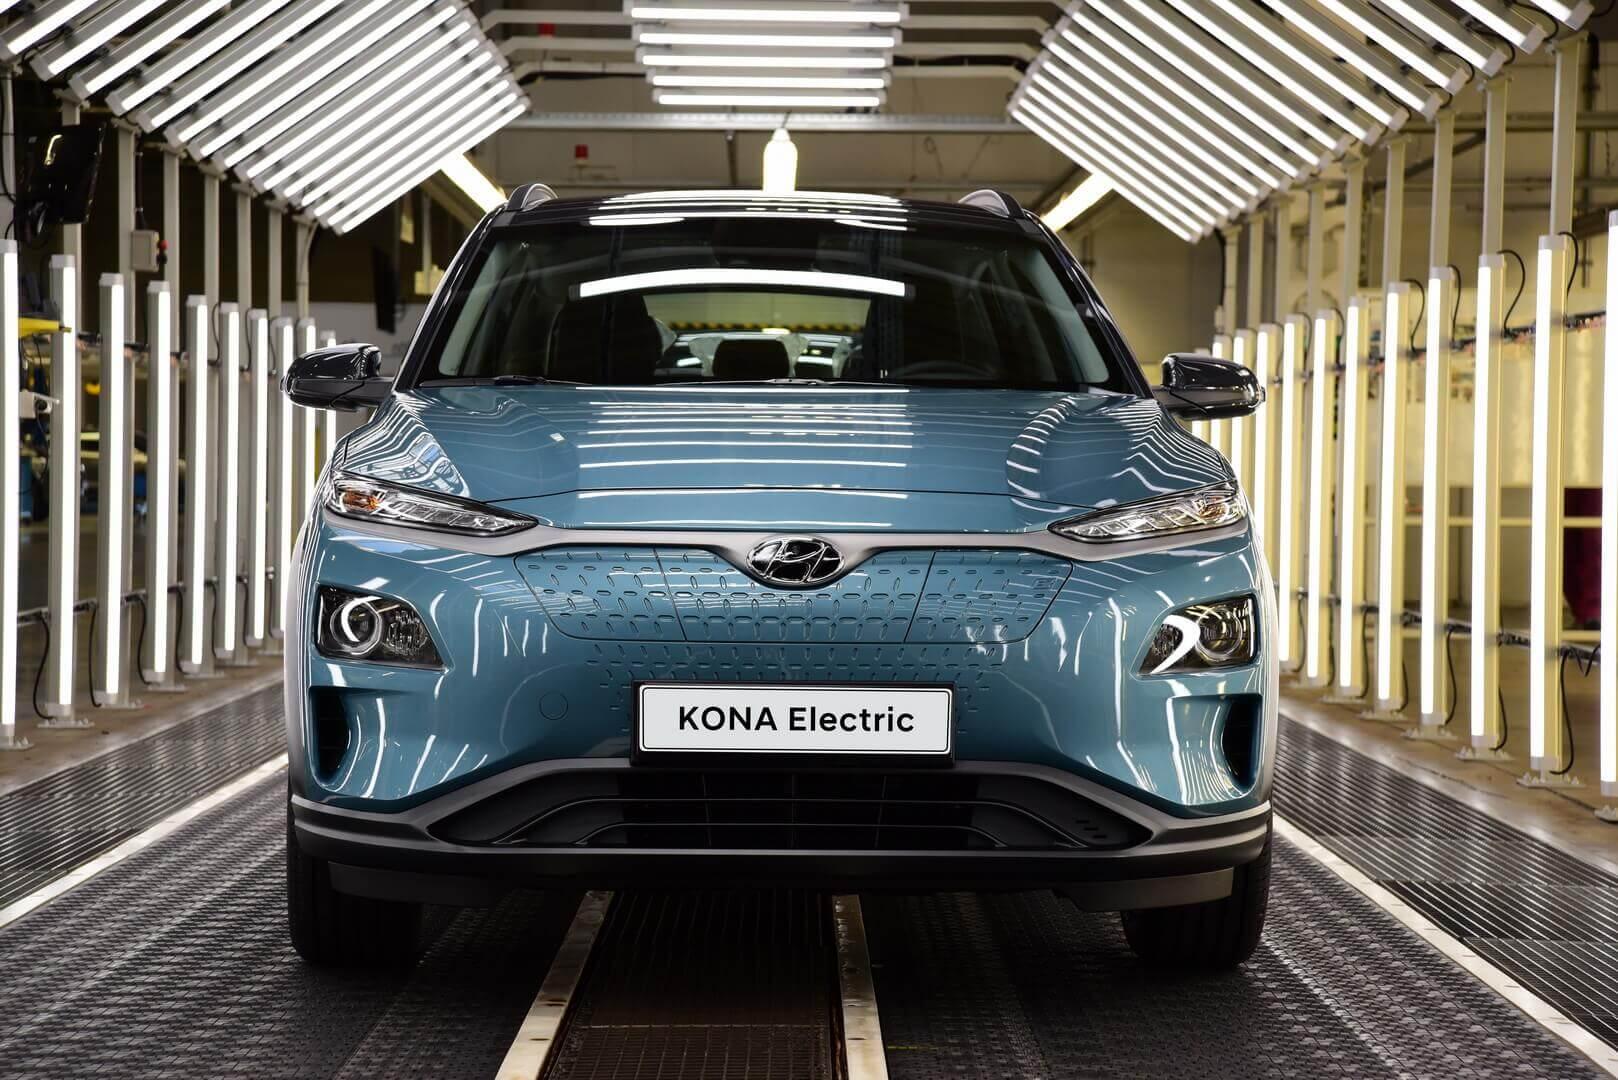 Hyundai начнет производить Kona Electric на чешском заводе с марта 2020 года